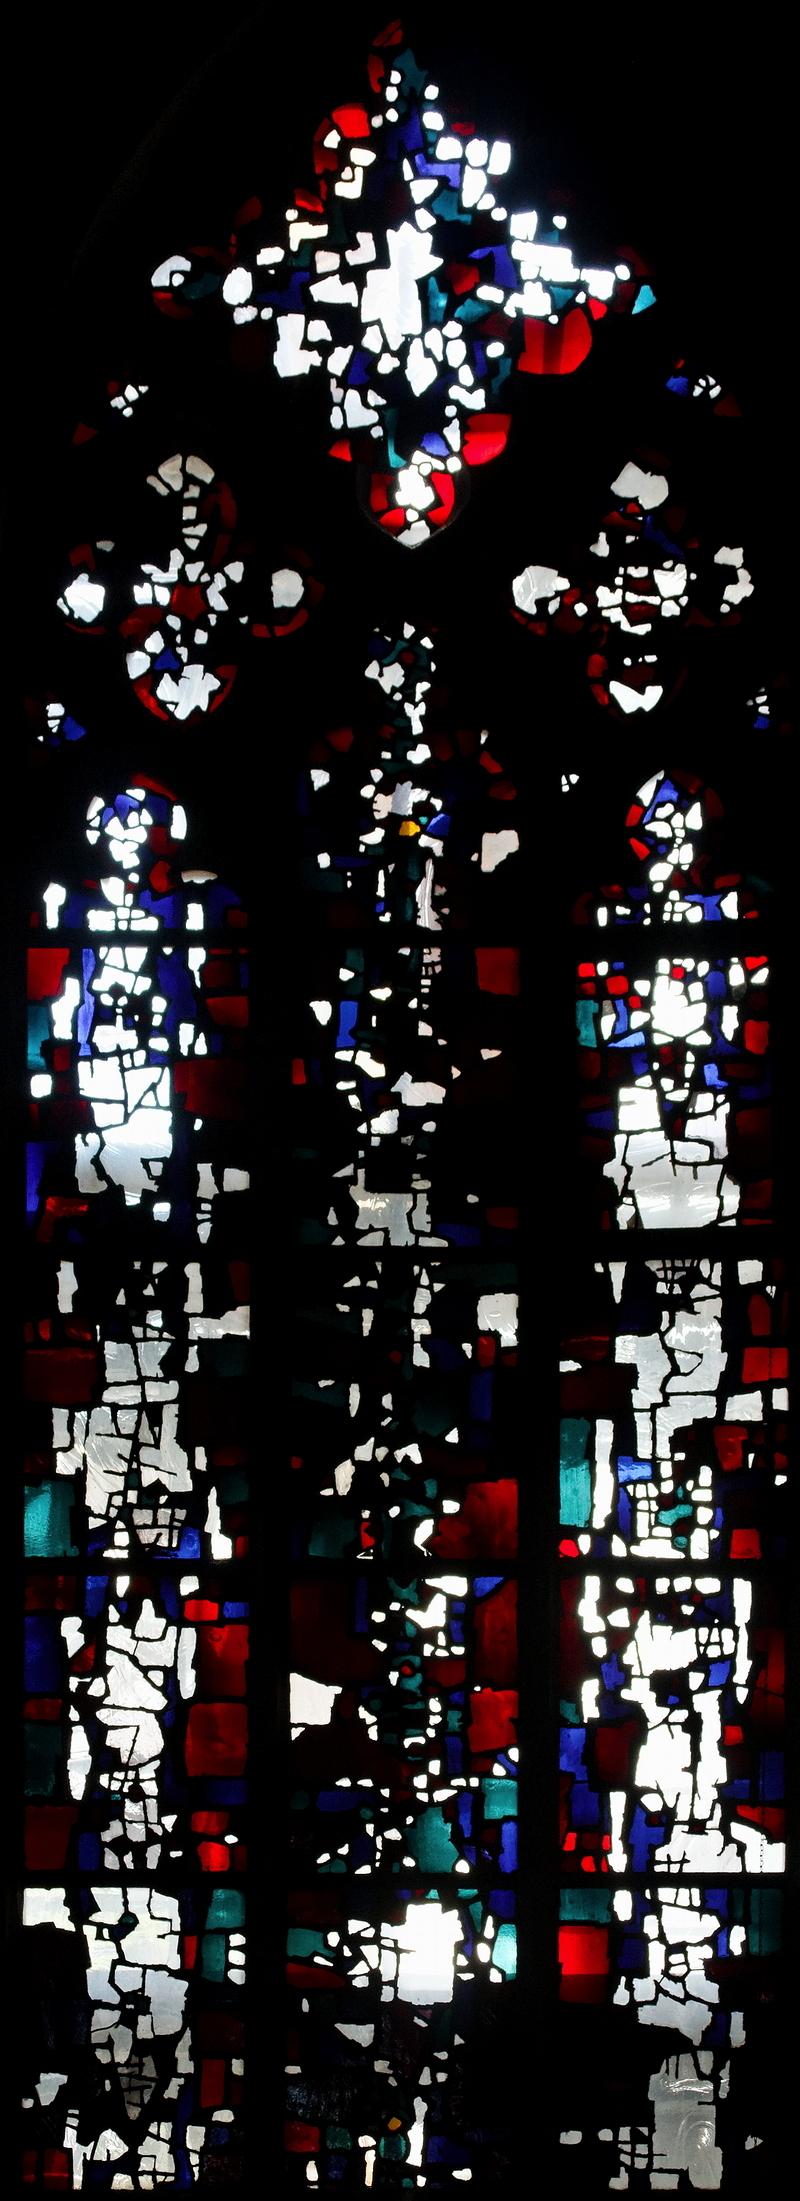 Citykirche, Mönchengladbach: Window